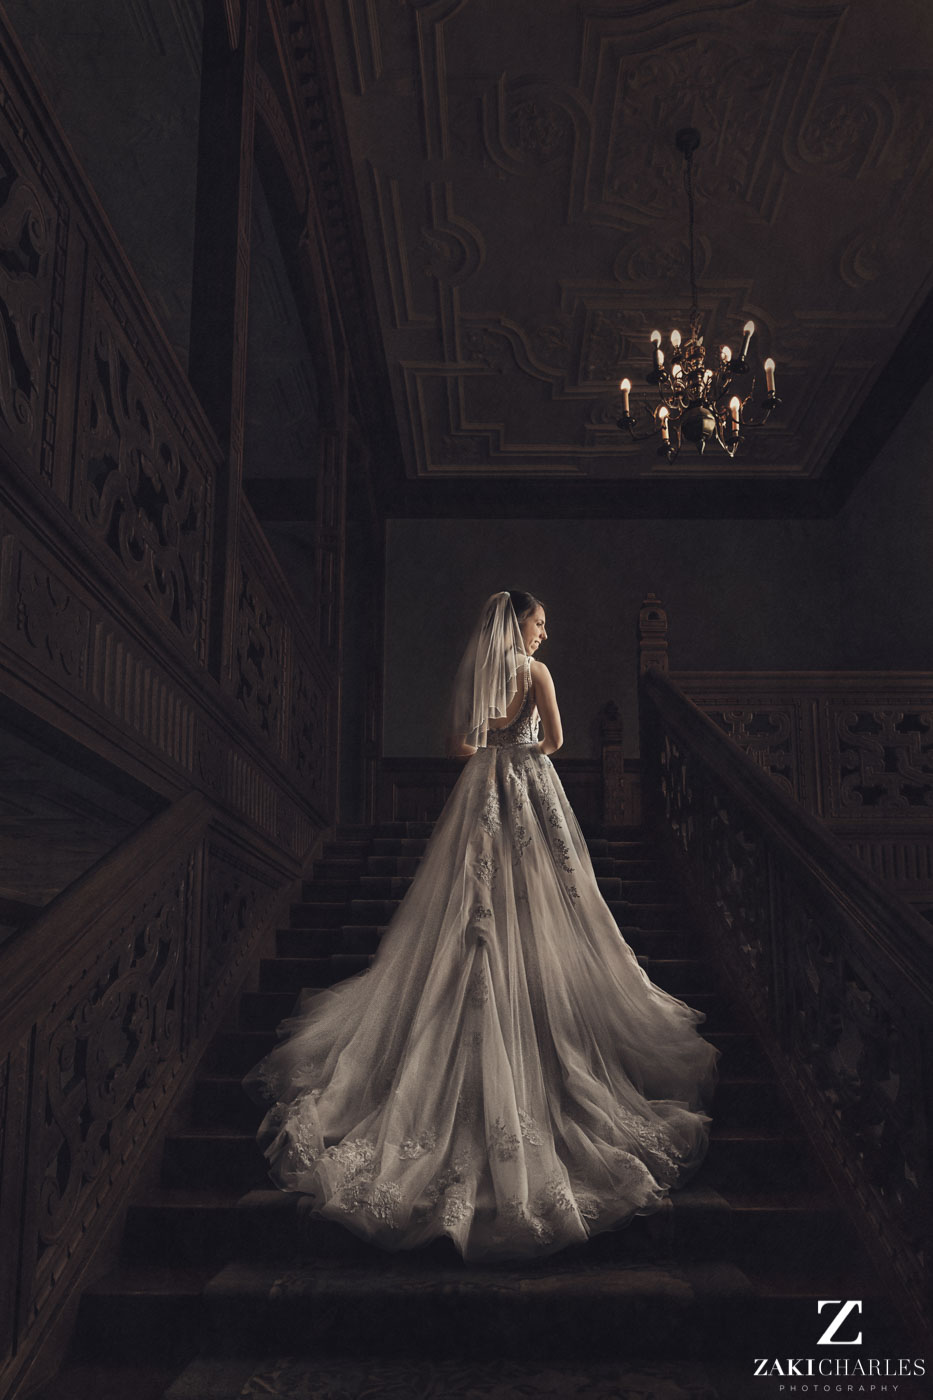 Fine art wedding photography by Zaki Charles 2